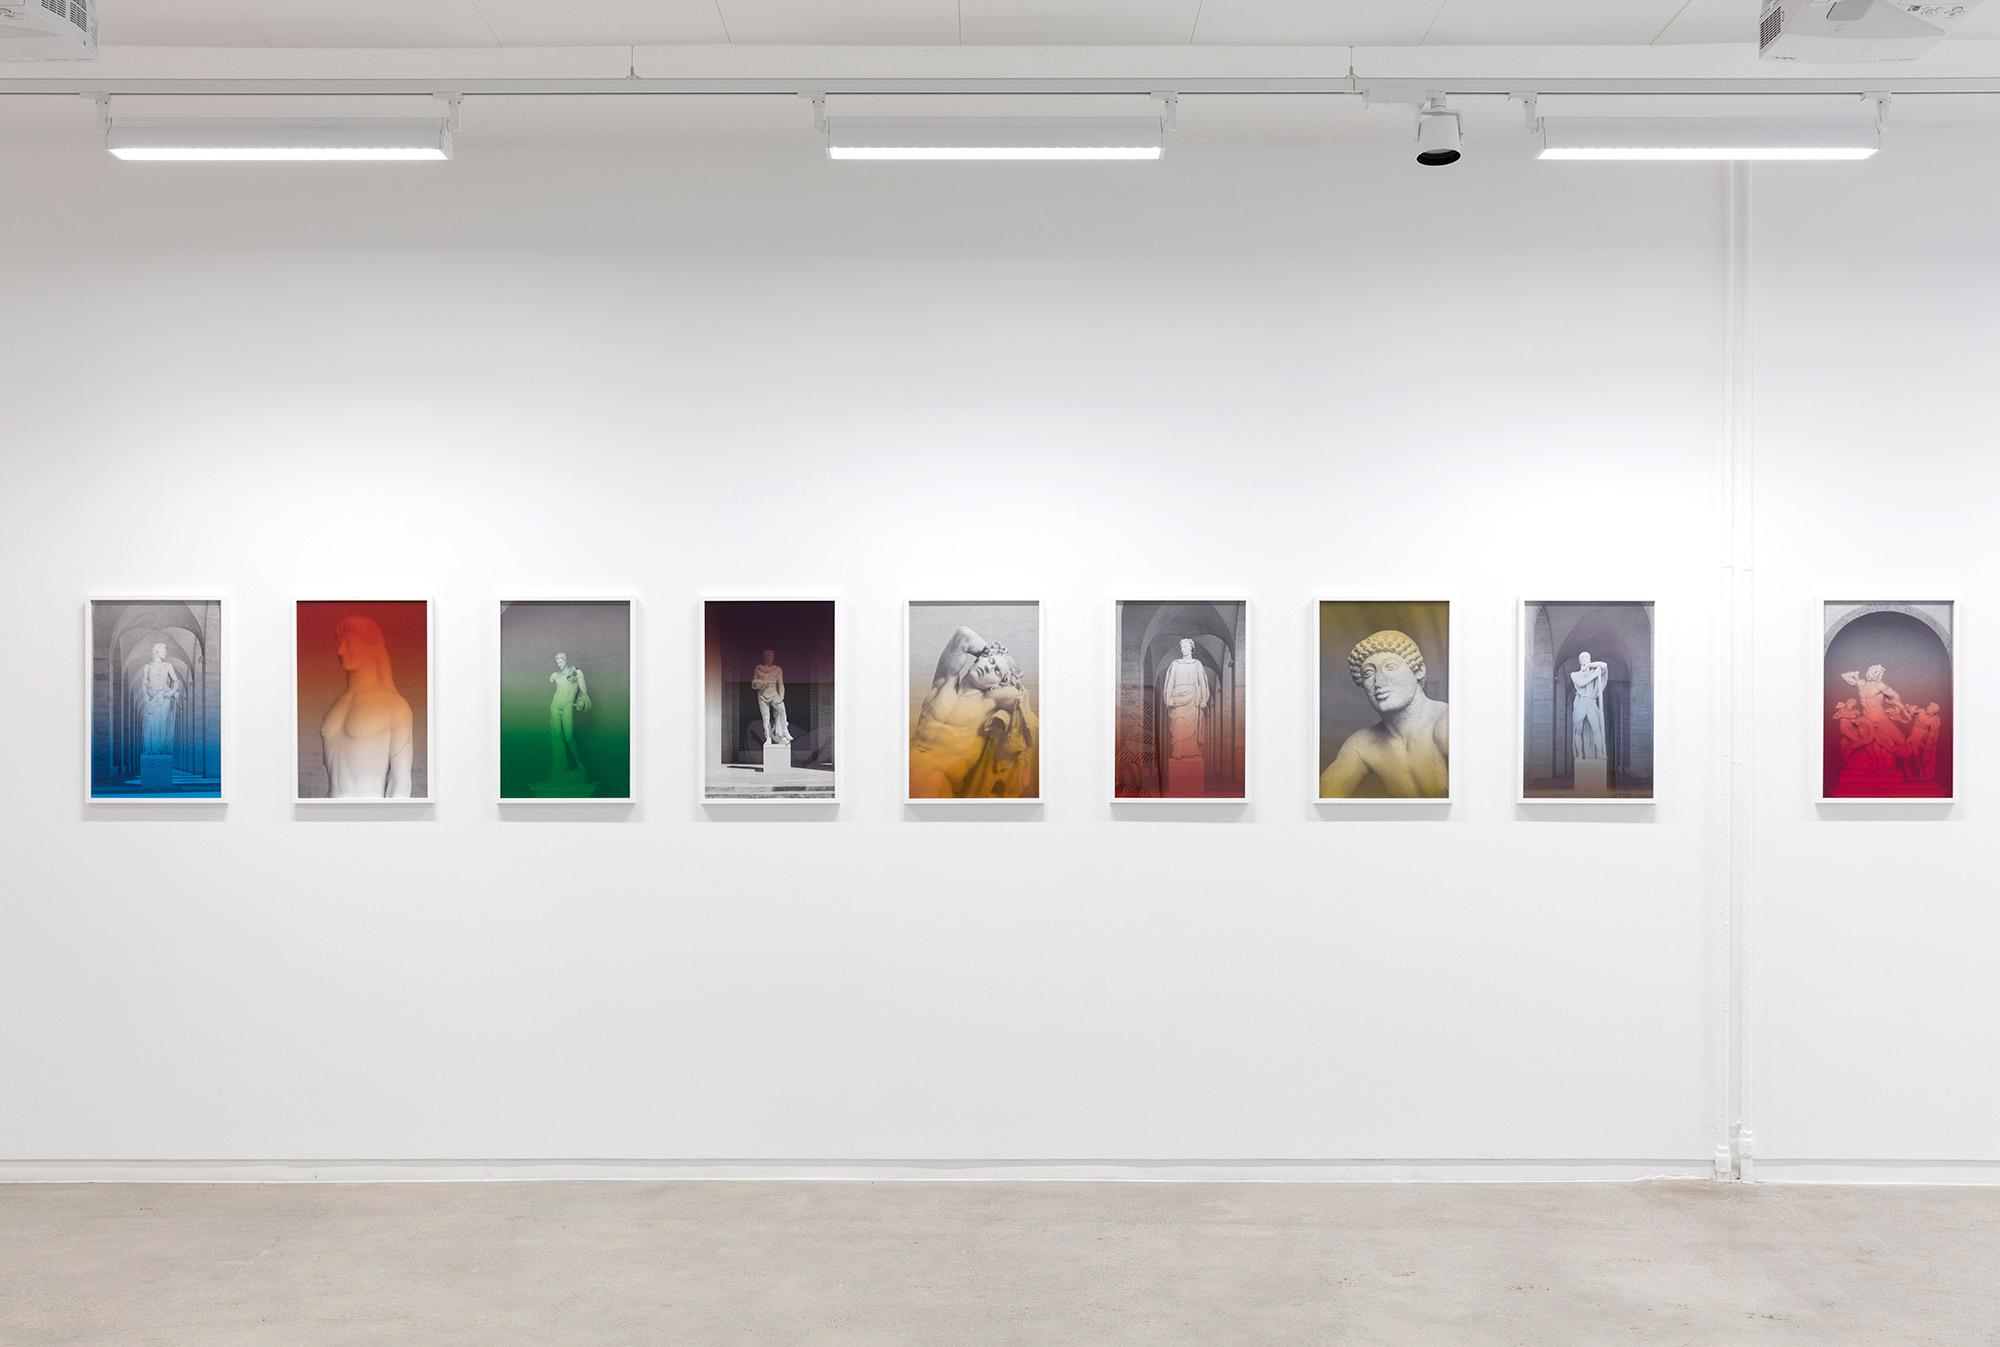 Espen Gleditsch at Golsa, curated by MELK 2018